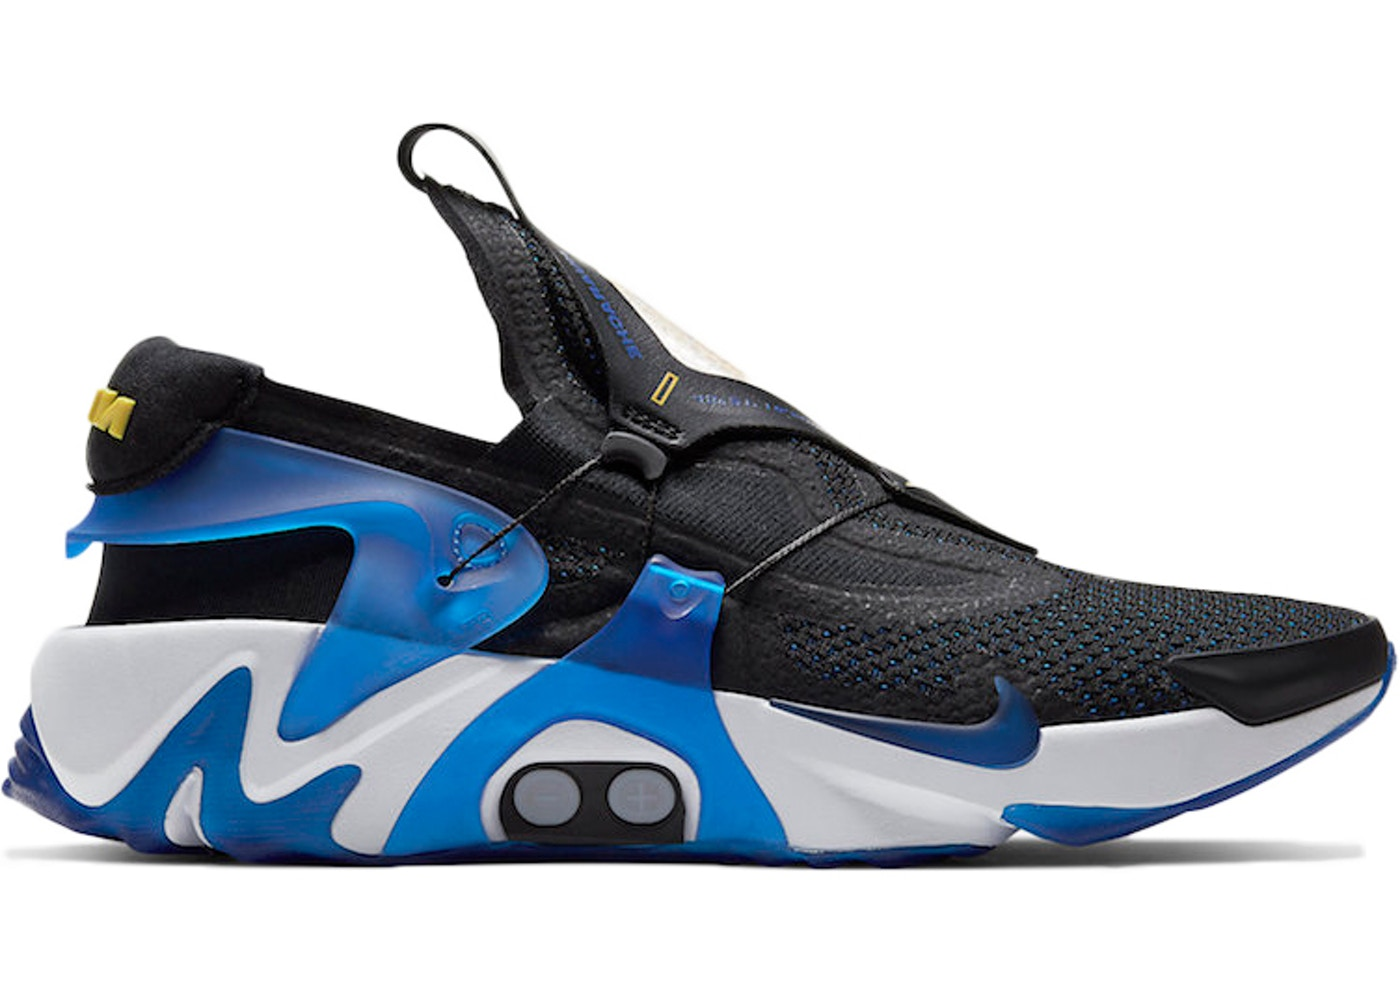 Nike Adapt Huarache Black Racer Blue Us Charger Bv6397 002